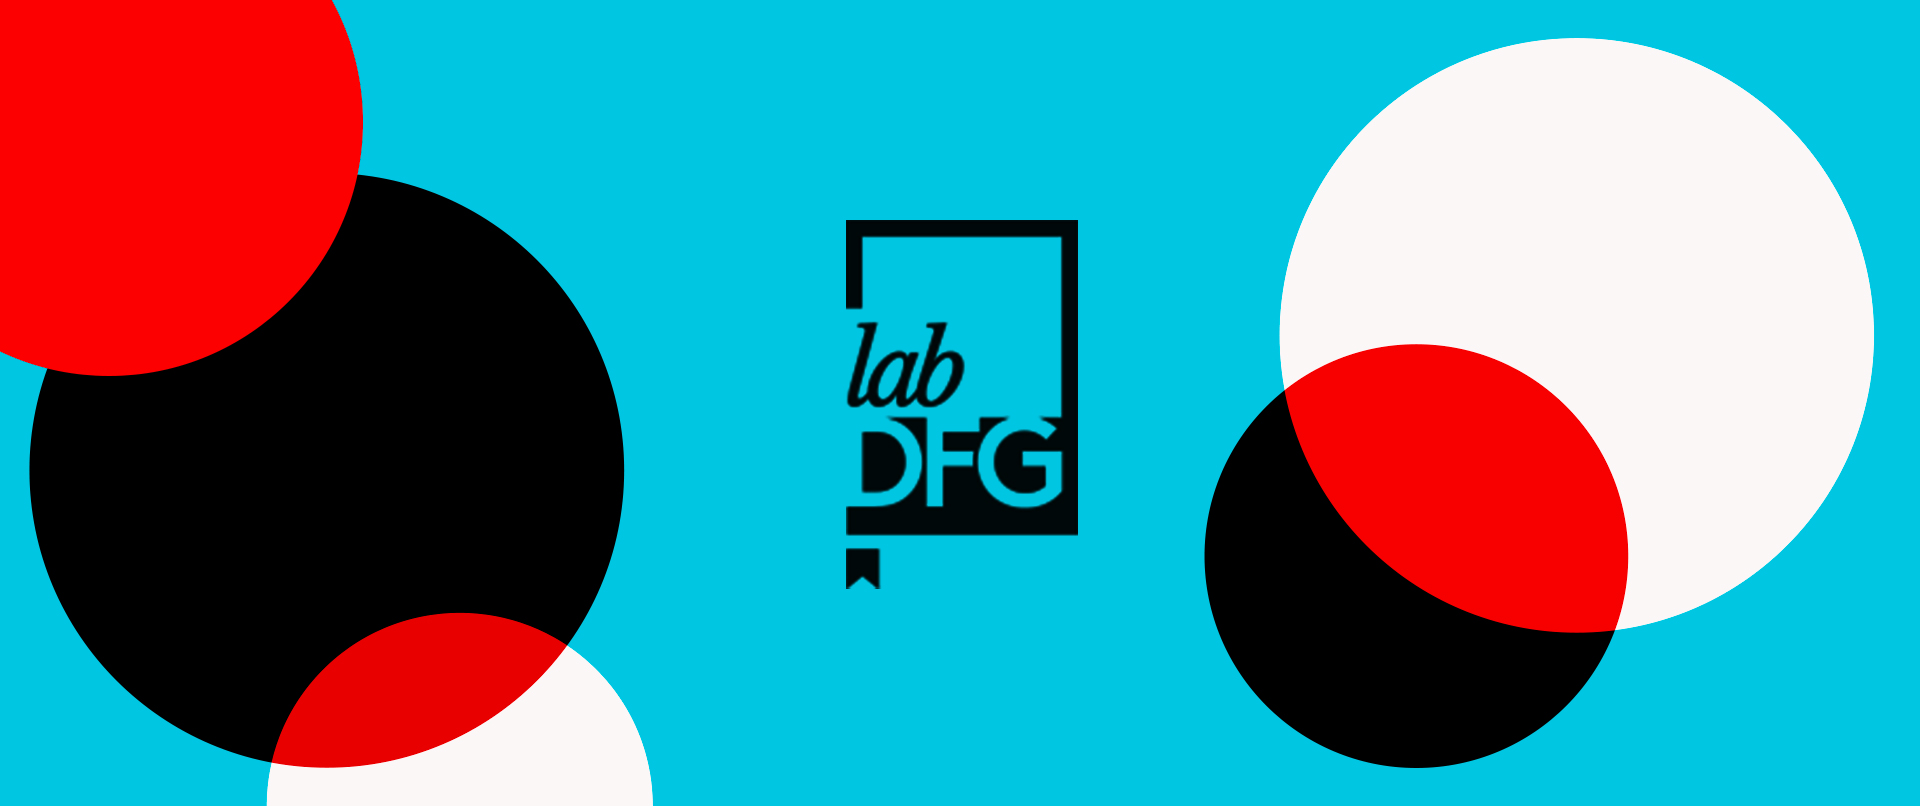 Lab DFG